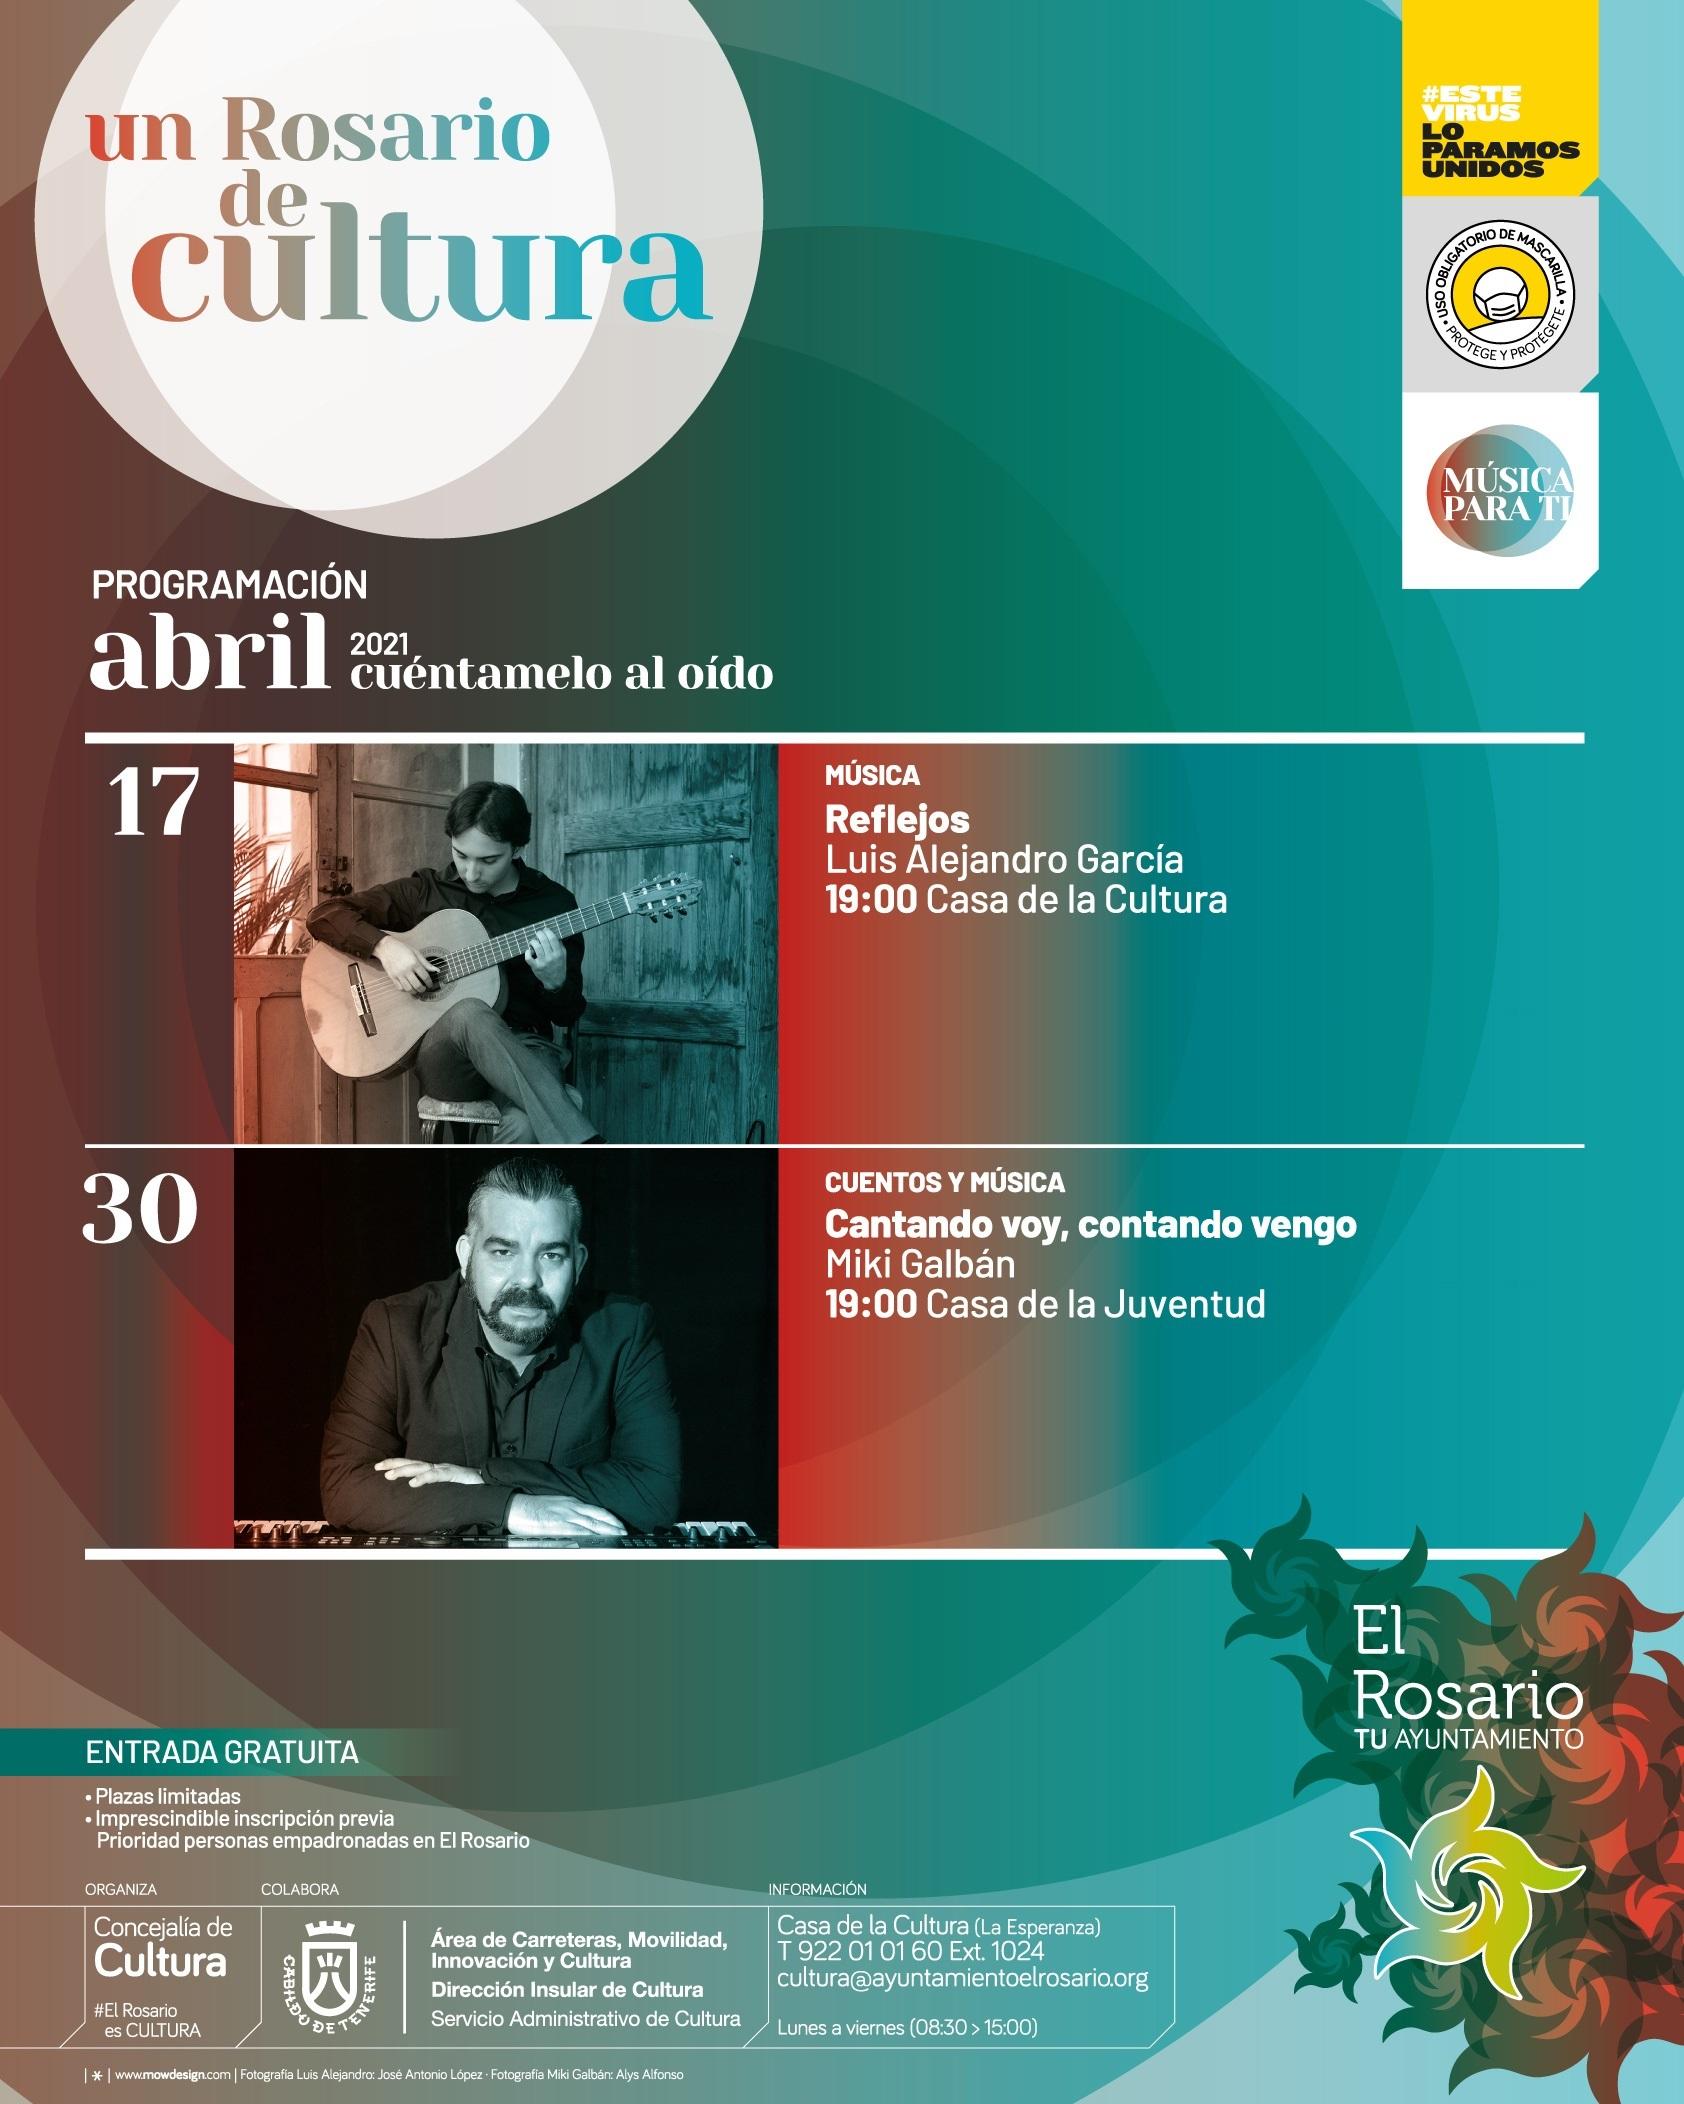 MUSICA_PARA_TI_2021-04_ABRIL-20210315-CARTEL_A3-20210330-01af-redes - copia